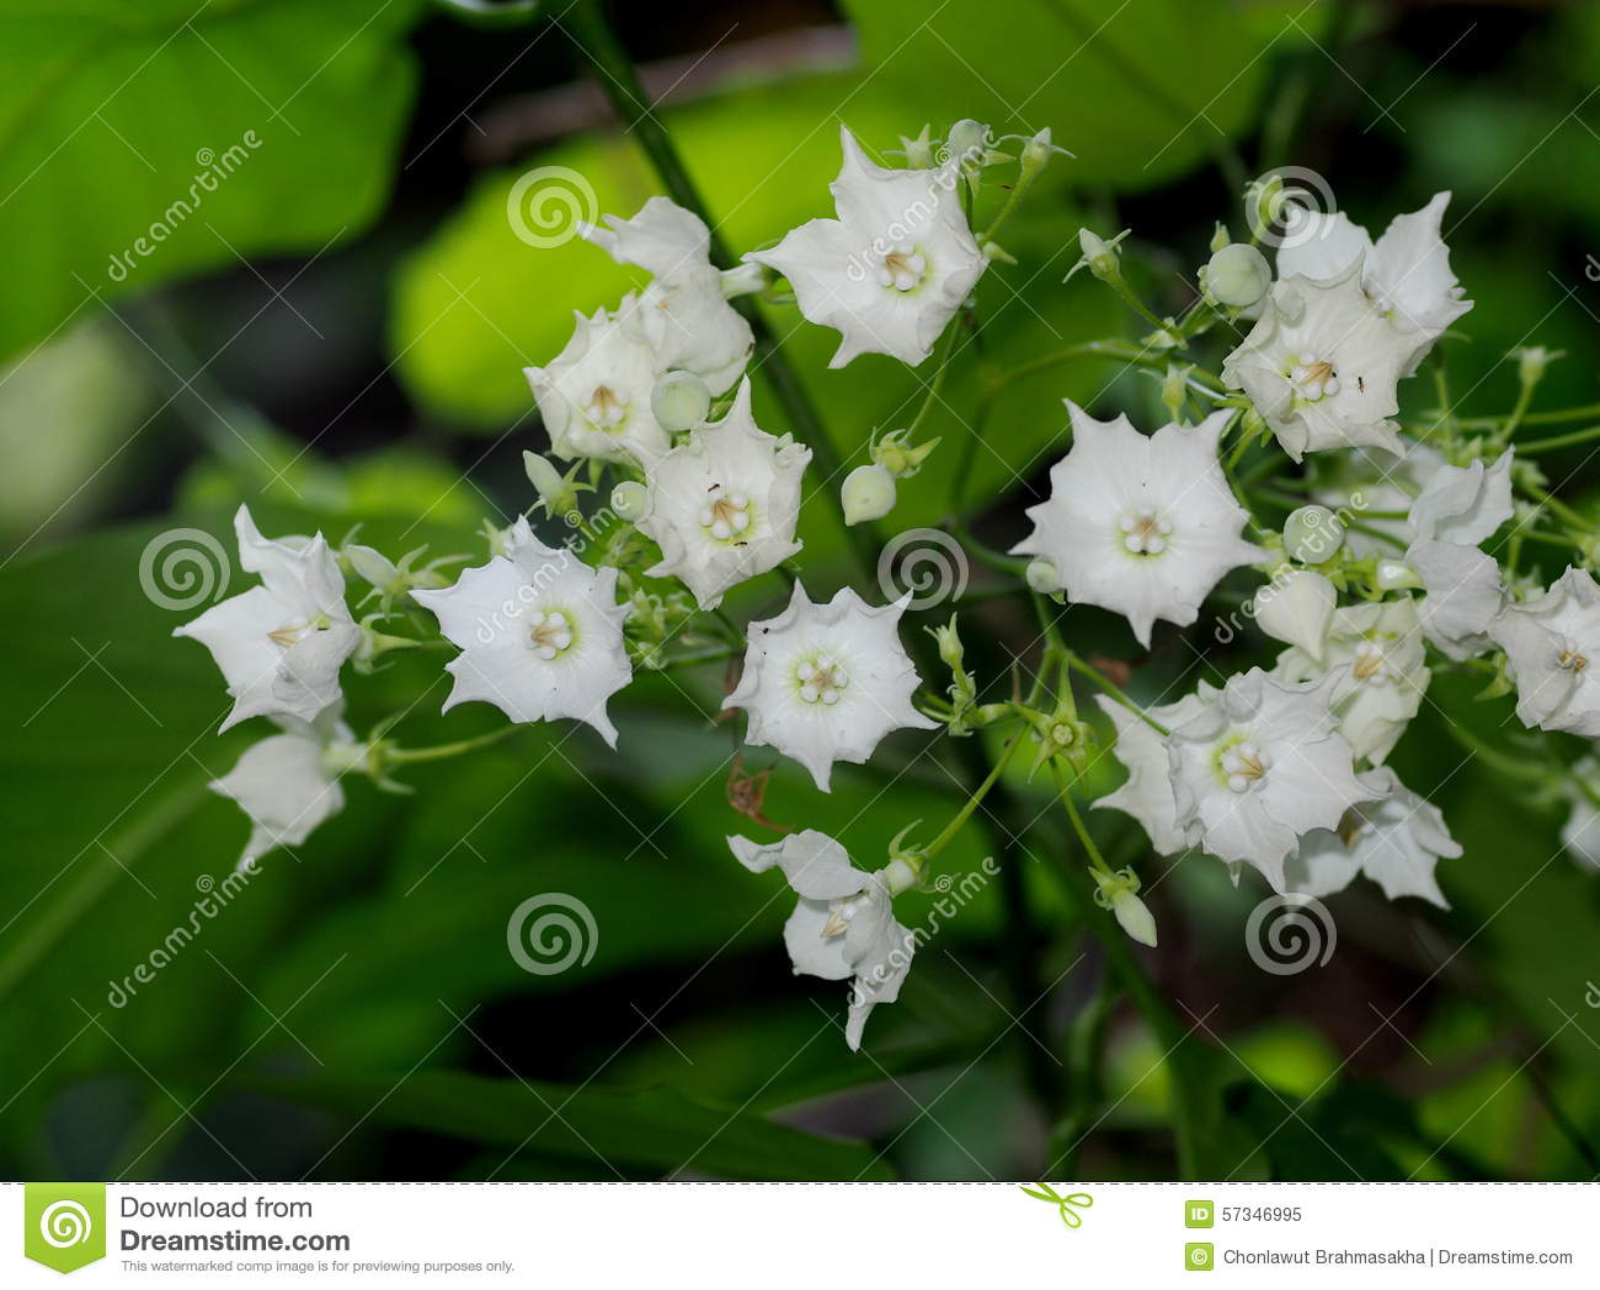 White Flowers Stock Image Image Of Cerbera Flowers 57346995